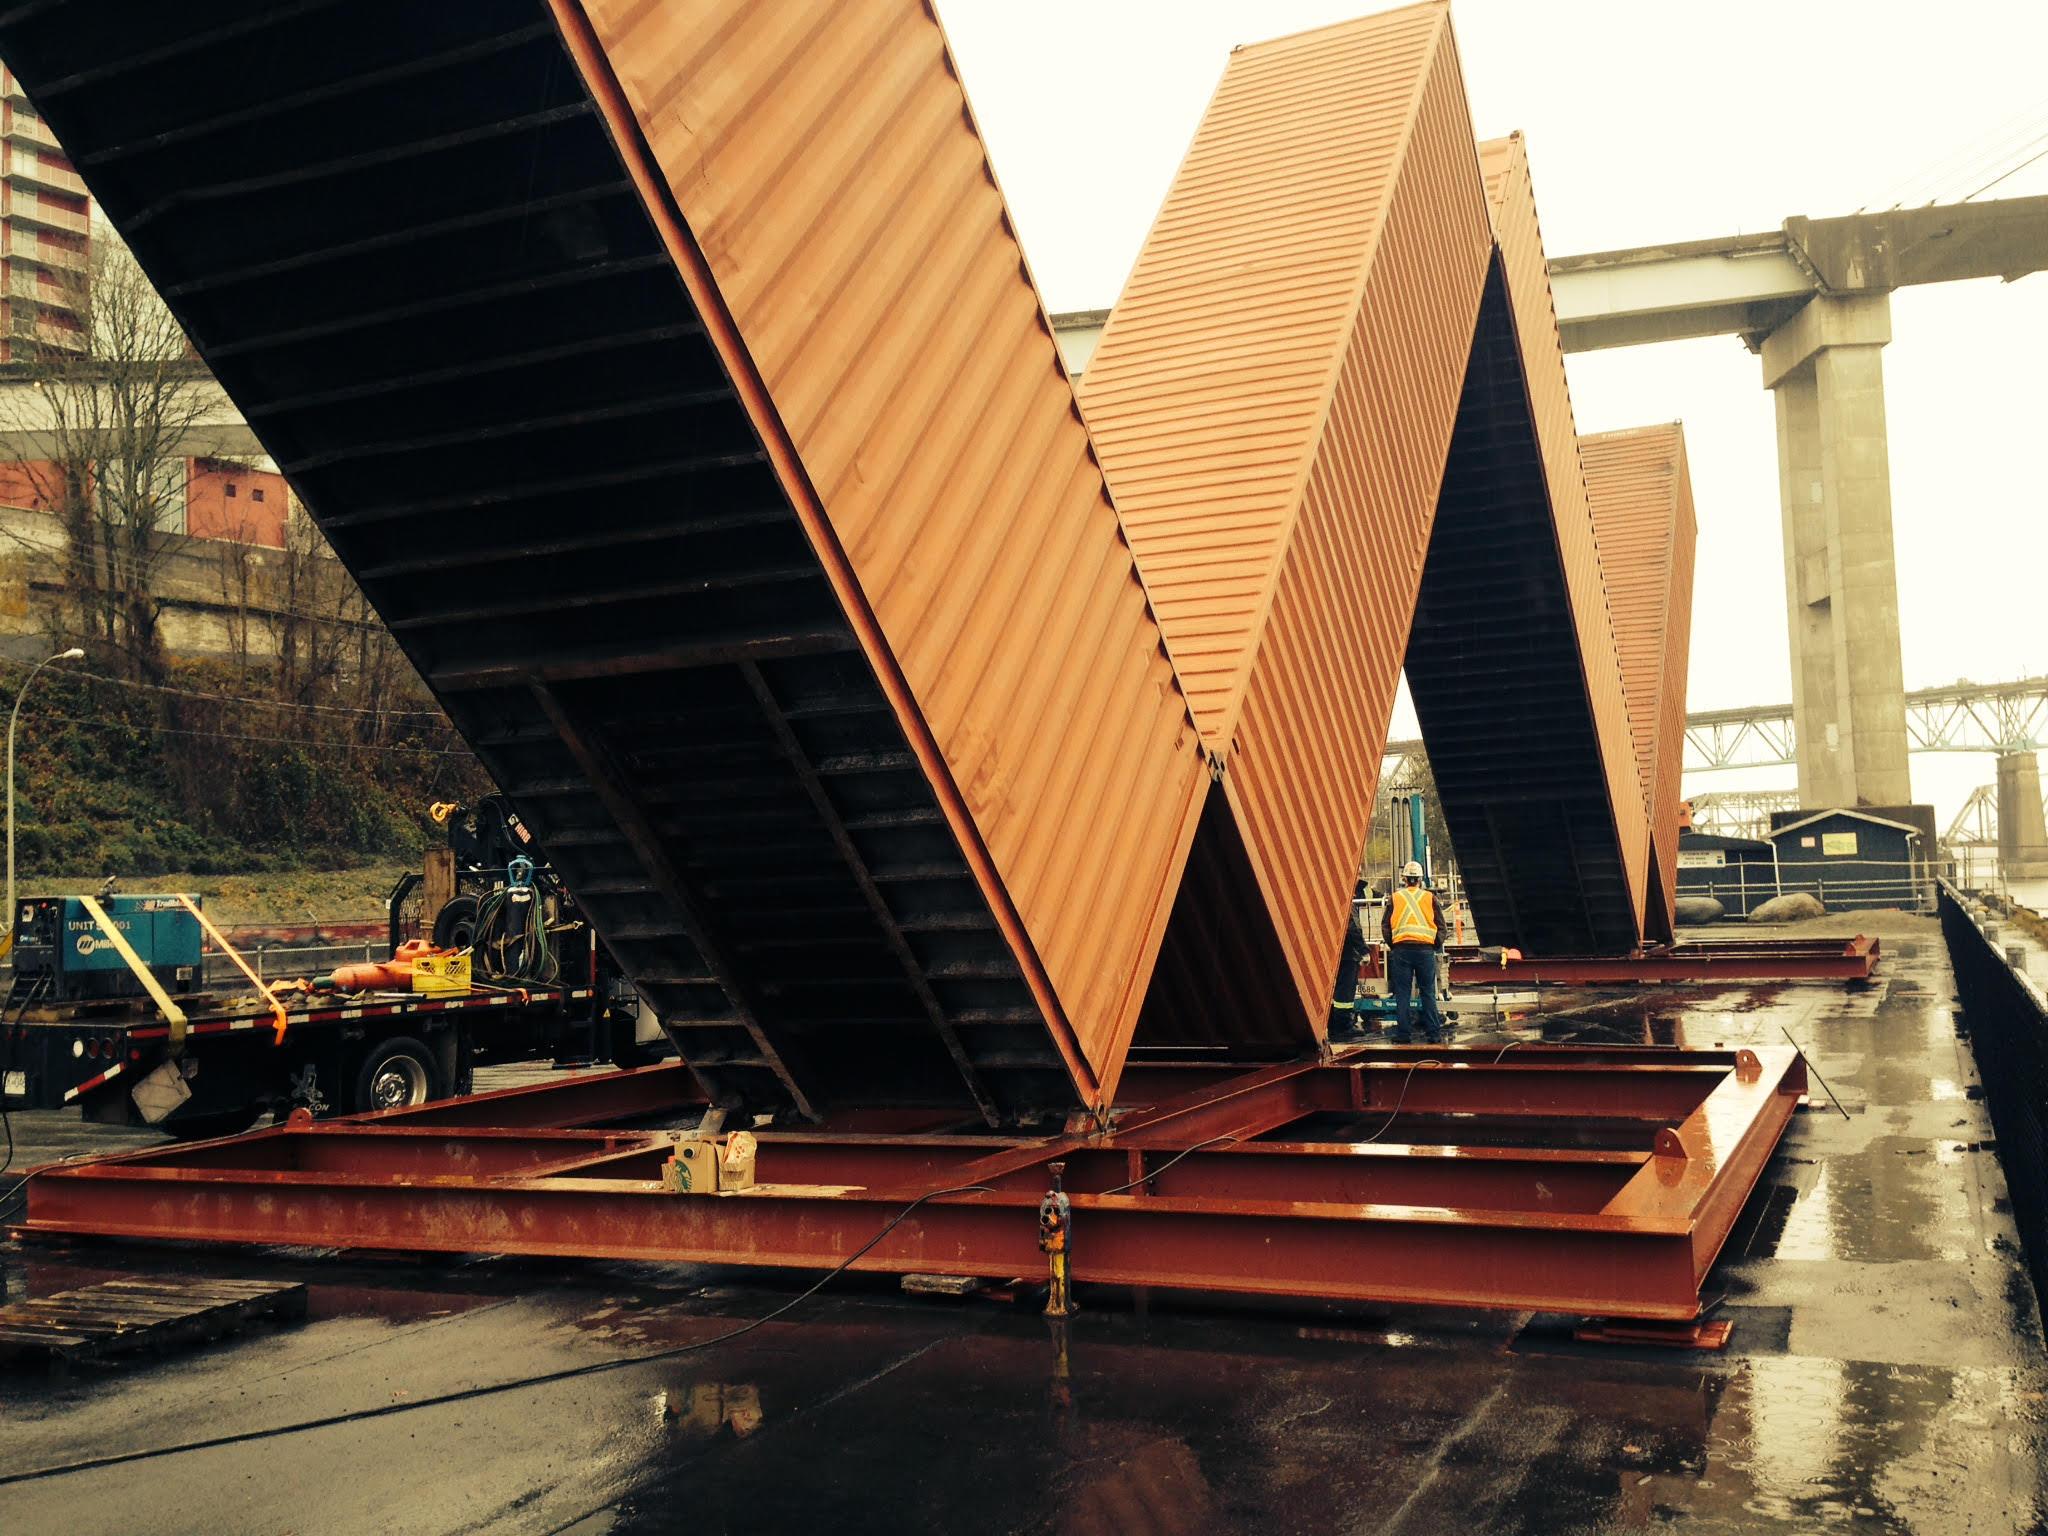 Image: Vancouver Biennale